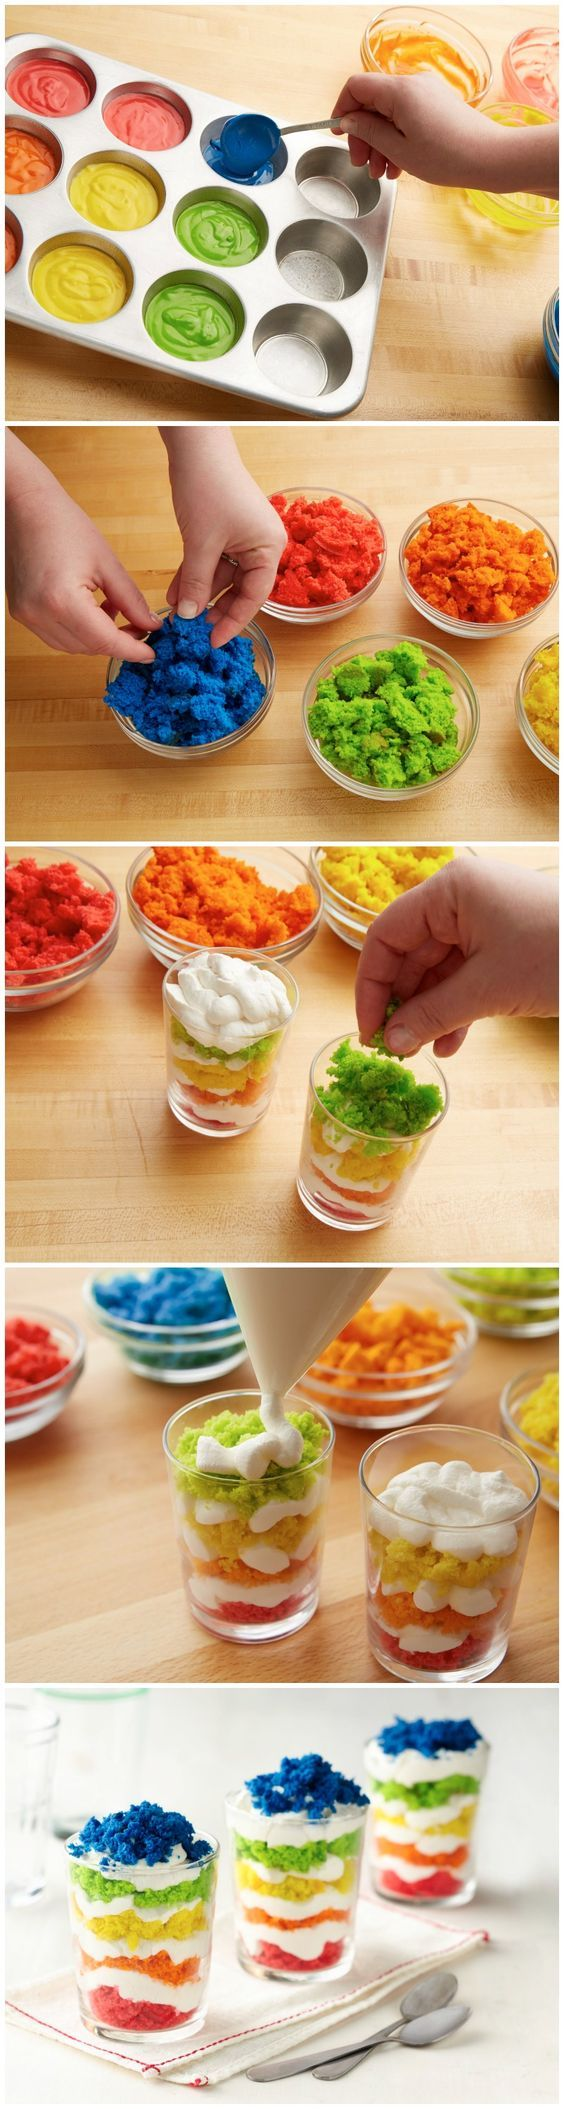 End-Of-The-Rainbow Cookie Parfaits #stpatricksday